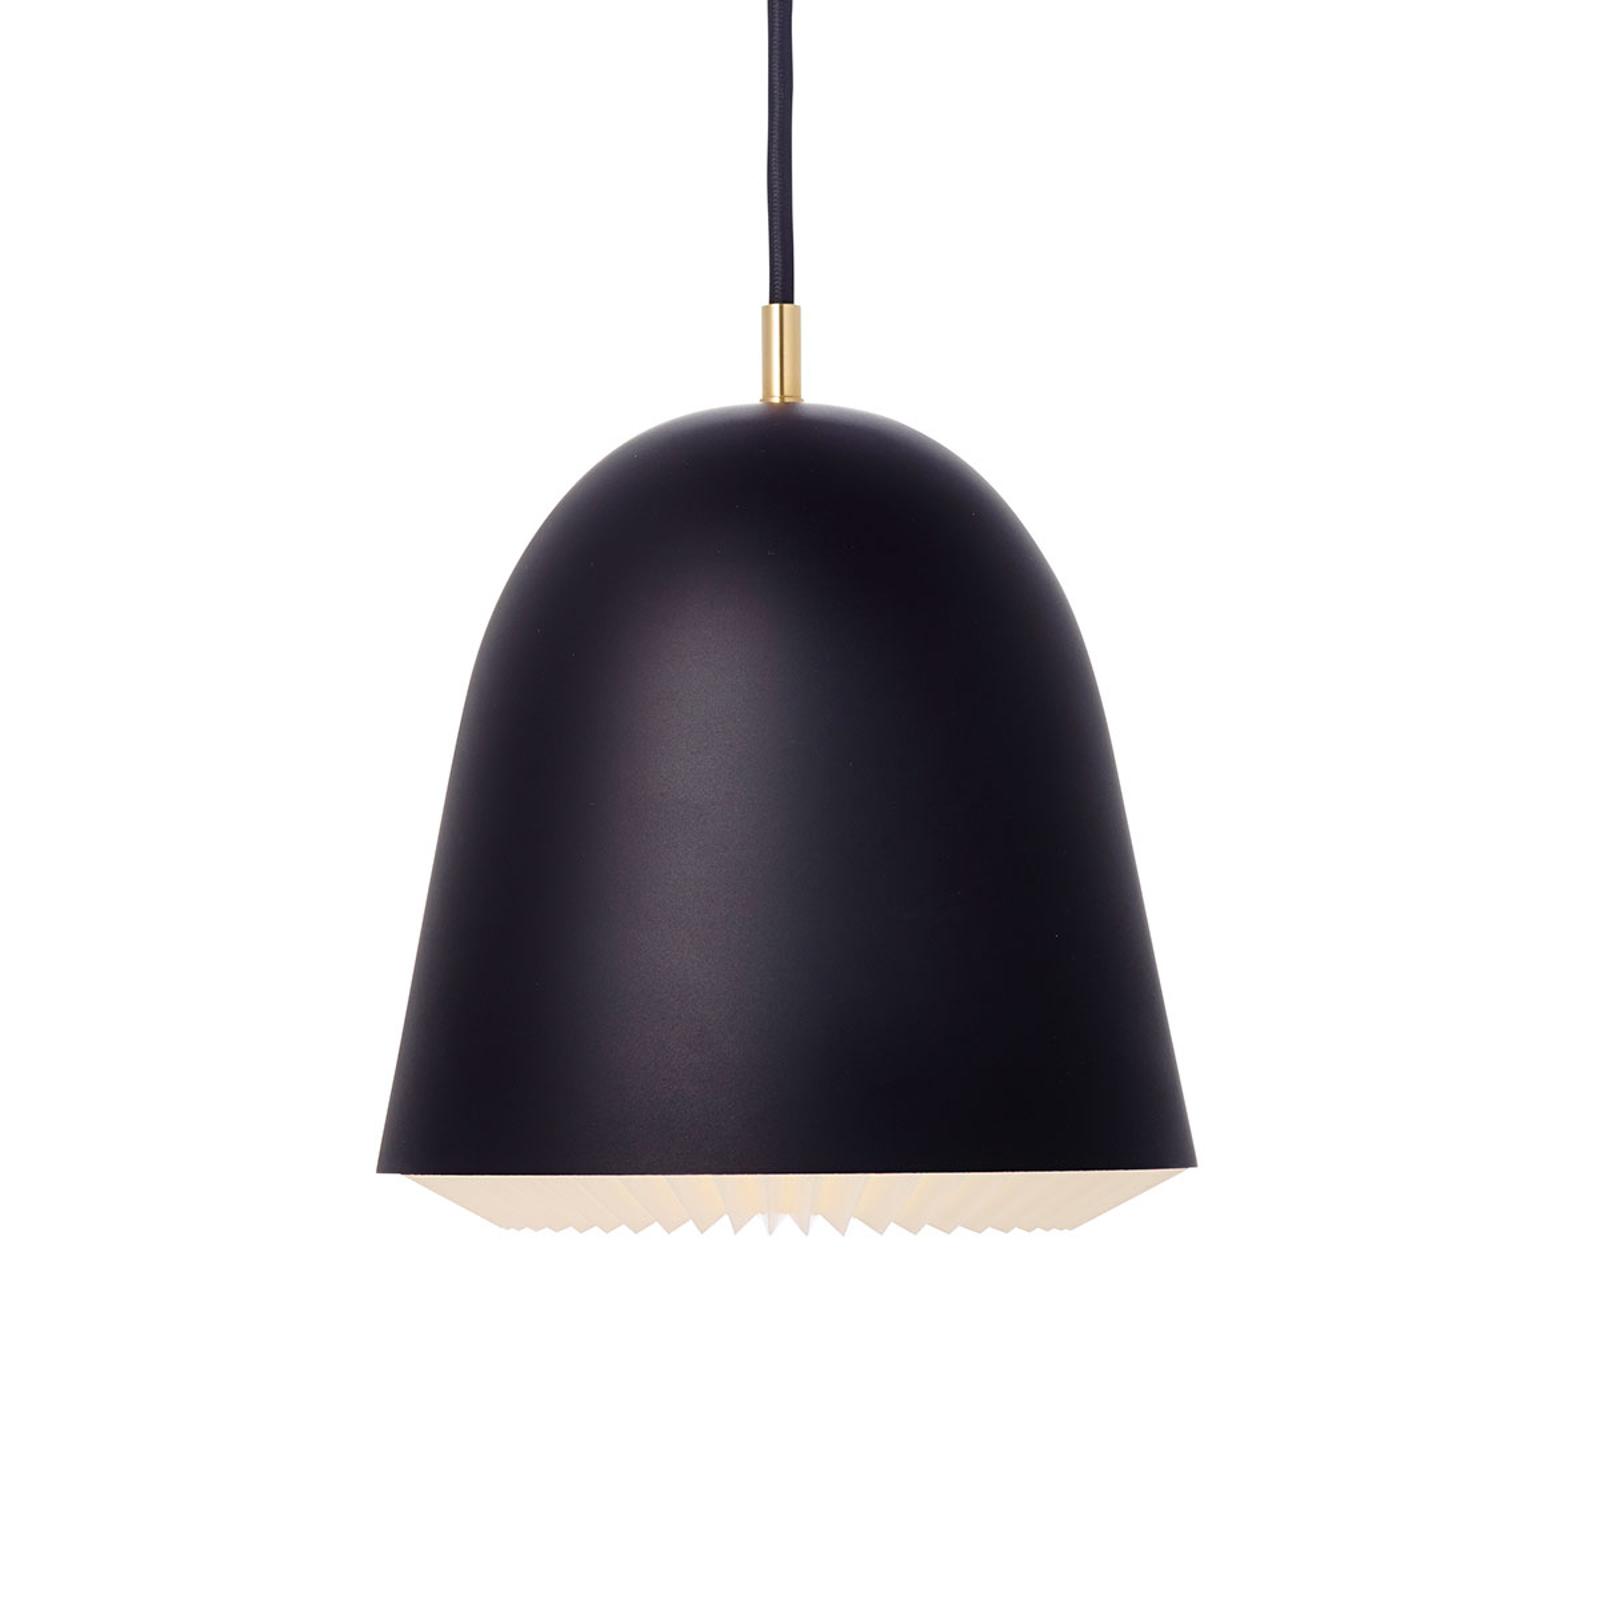 LE KLINT Caché - lampa wisząca, czarna, 20 cm